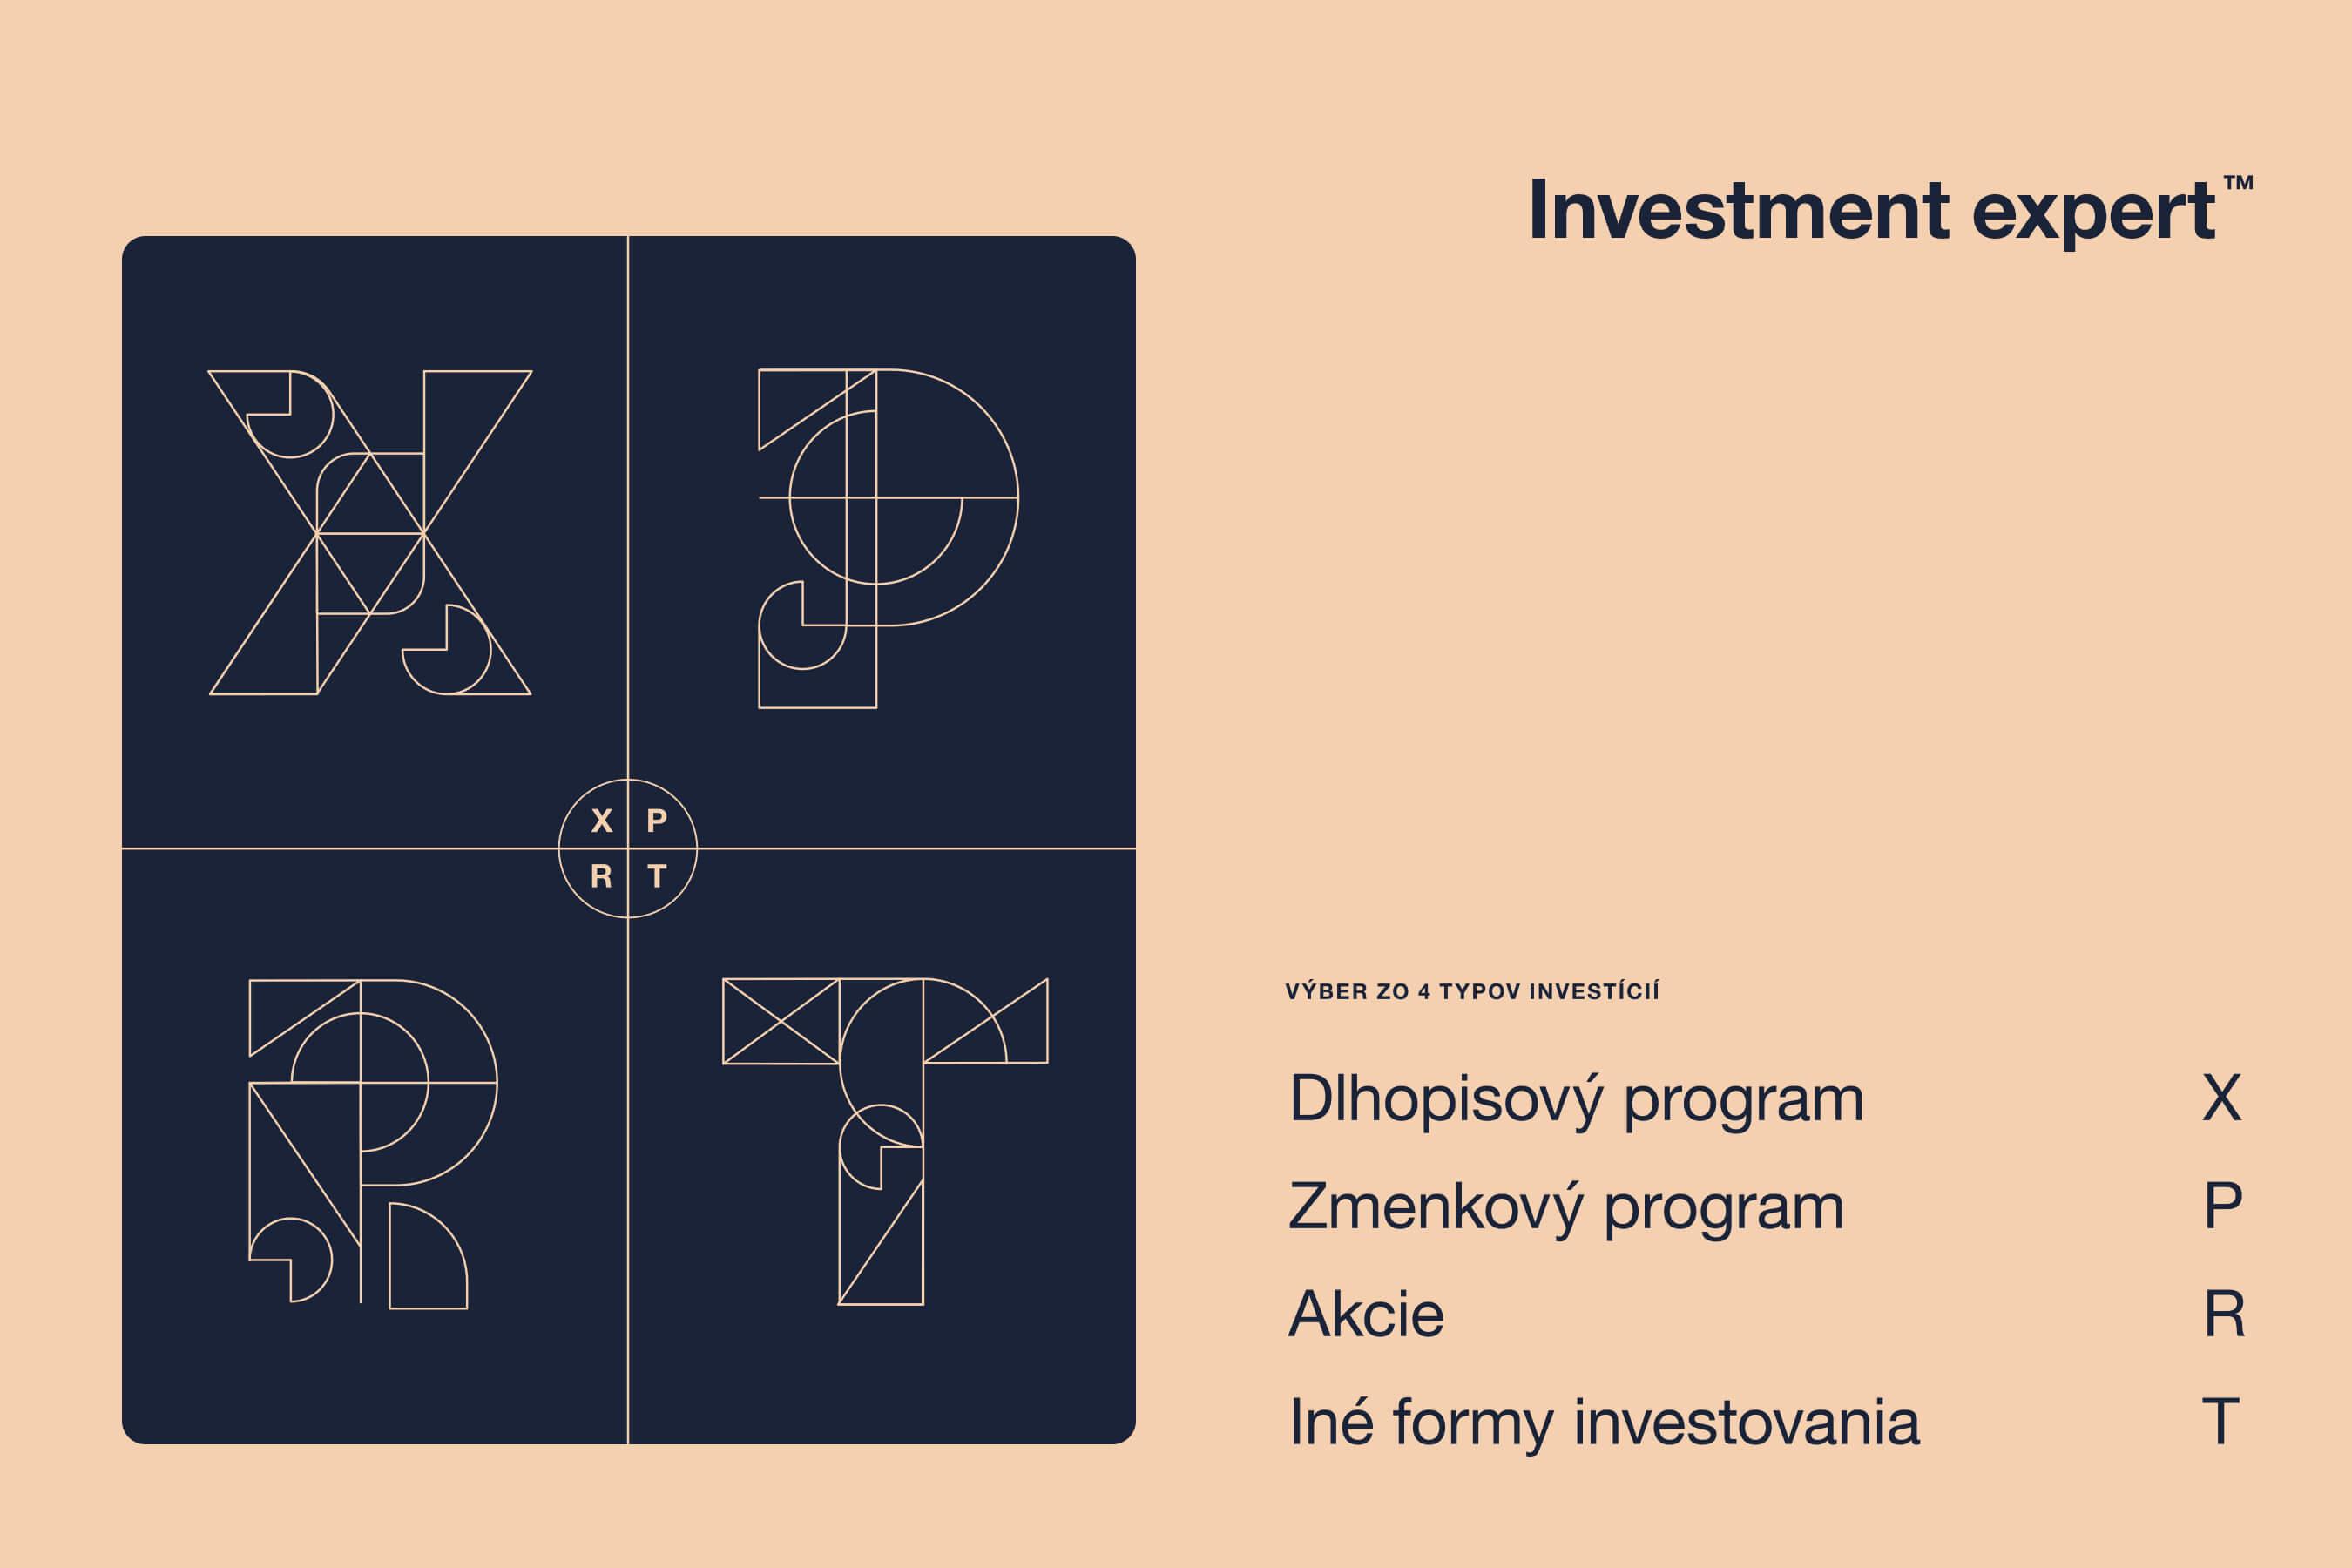 xprt_typ_investicii